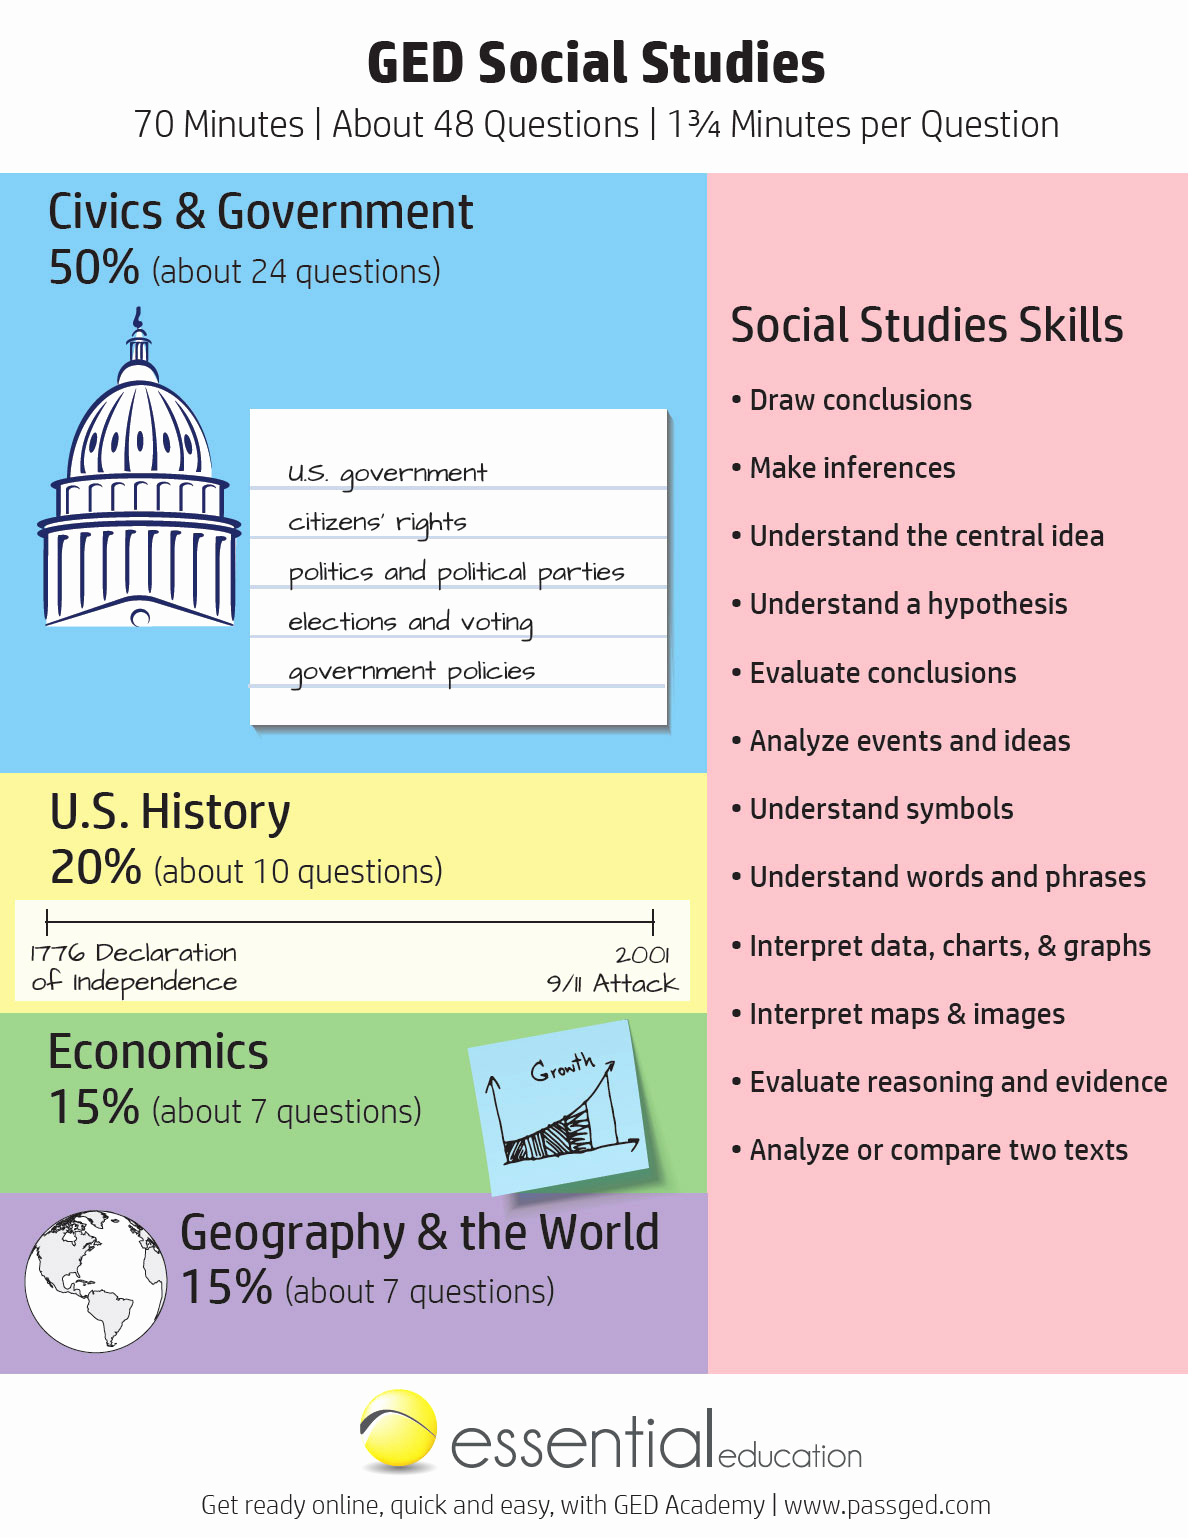 Hiset social Studies Worksheets Awesome 30 Hiset social Stu S Worksheets